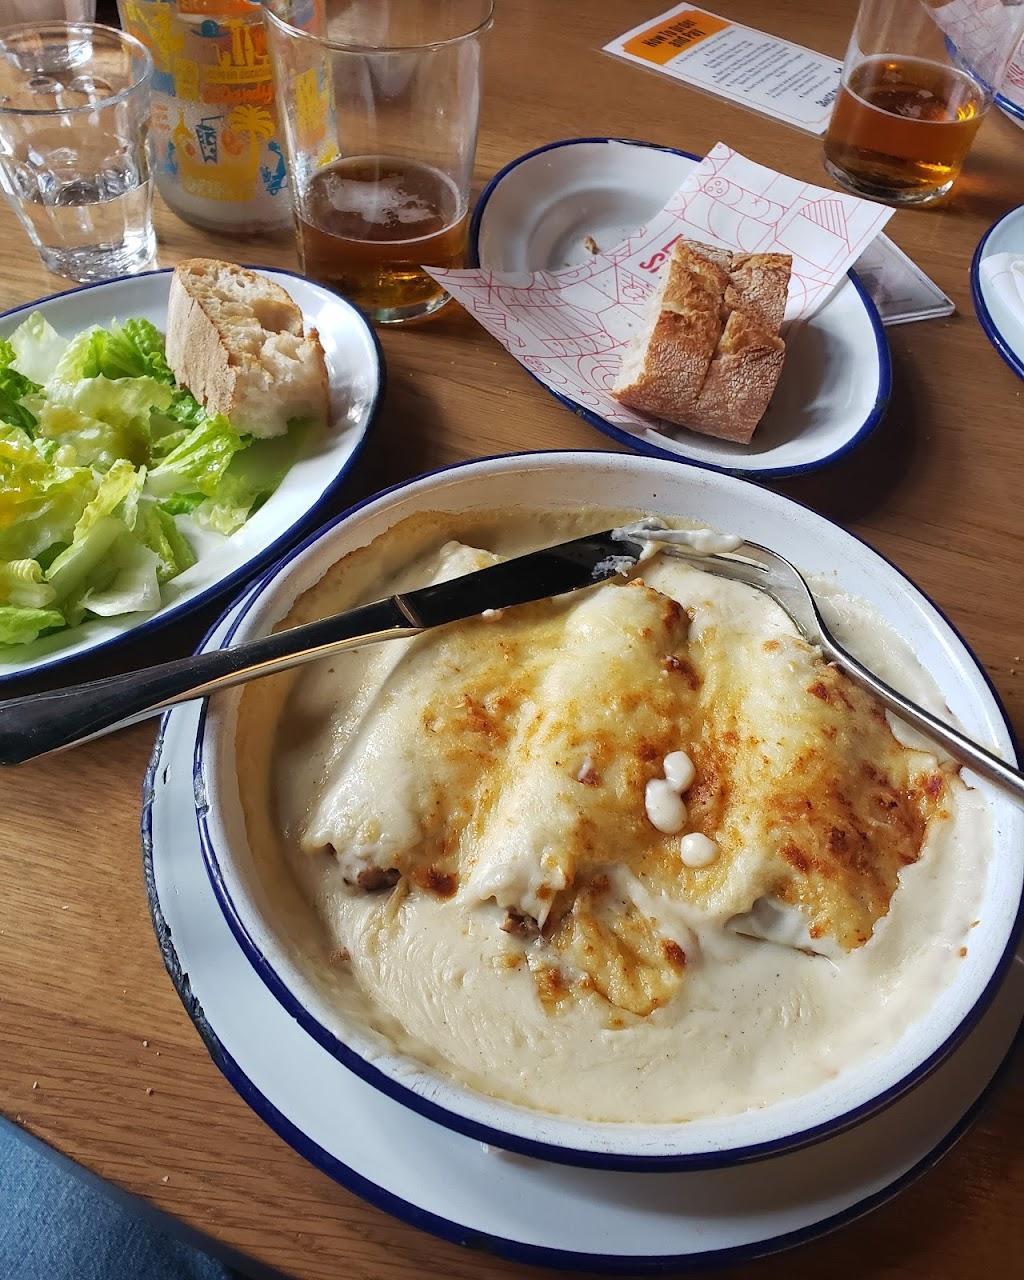 Spanish Diner | restaurant | 435 W 30th St, New York, NY 10001, USA | 6464951242 OR +1 646-495-1242